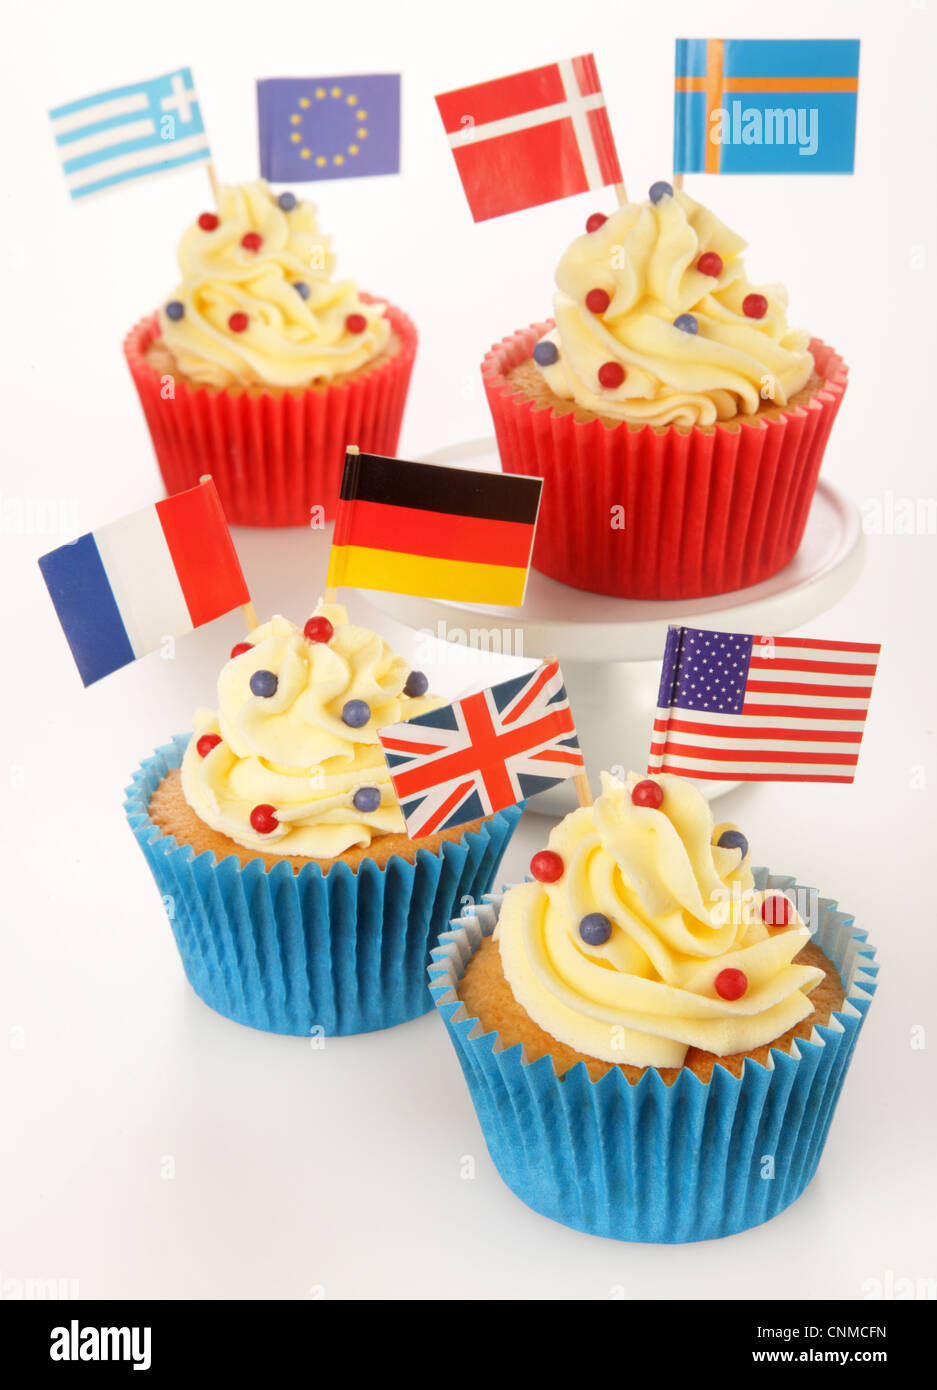 INTERNATIONAL CUPCAKES - Stock Image